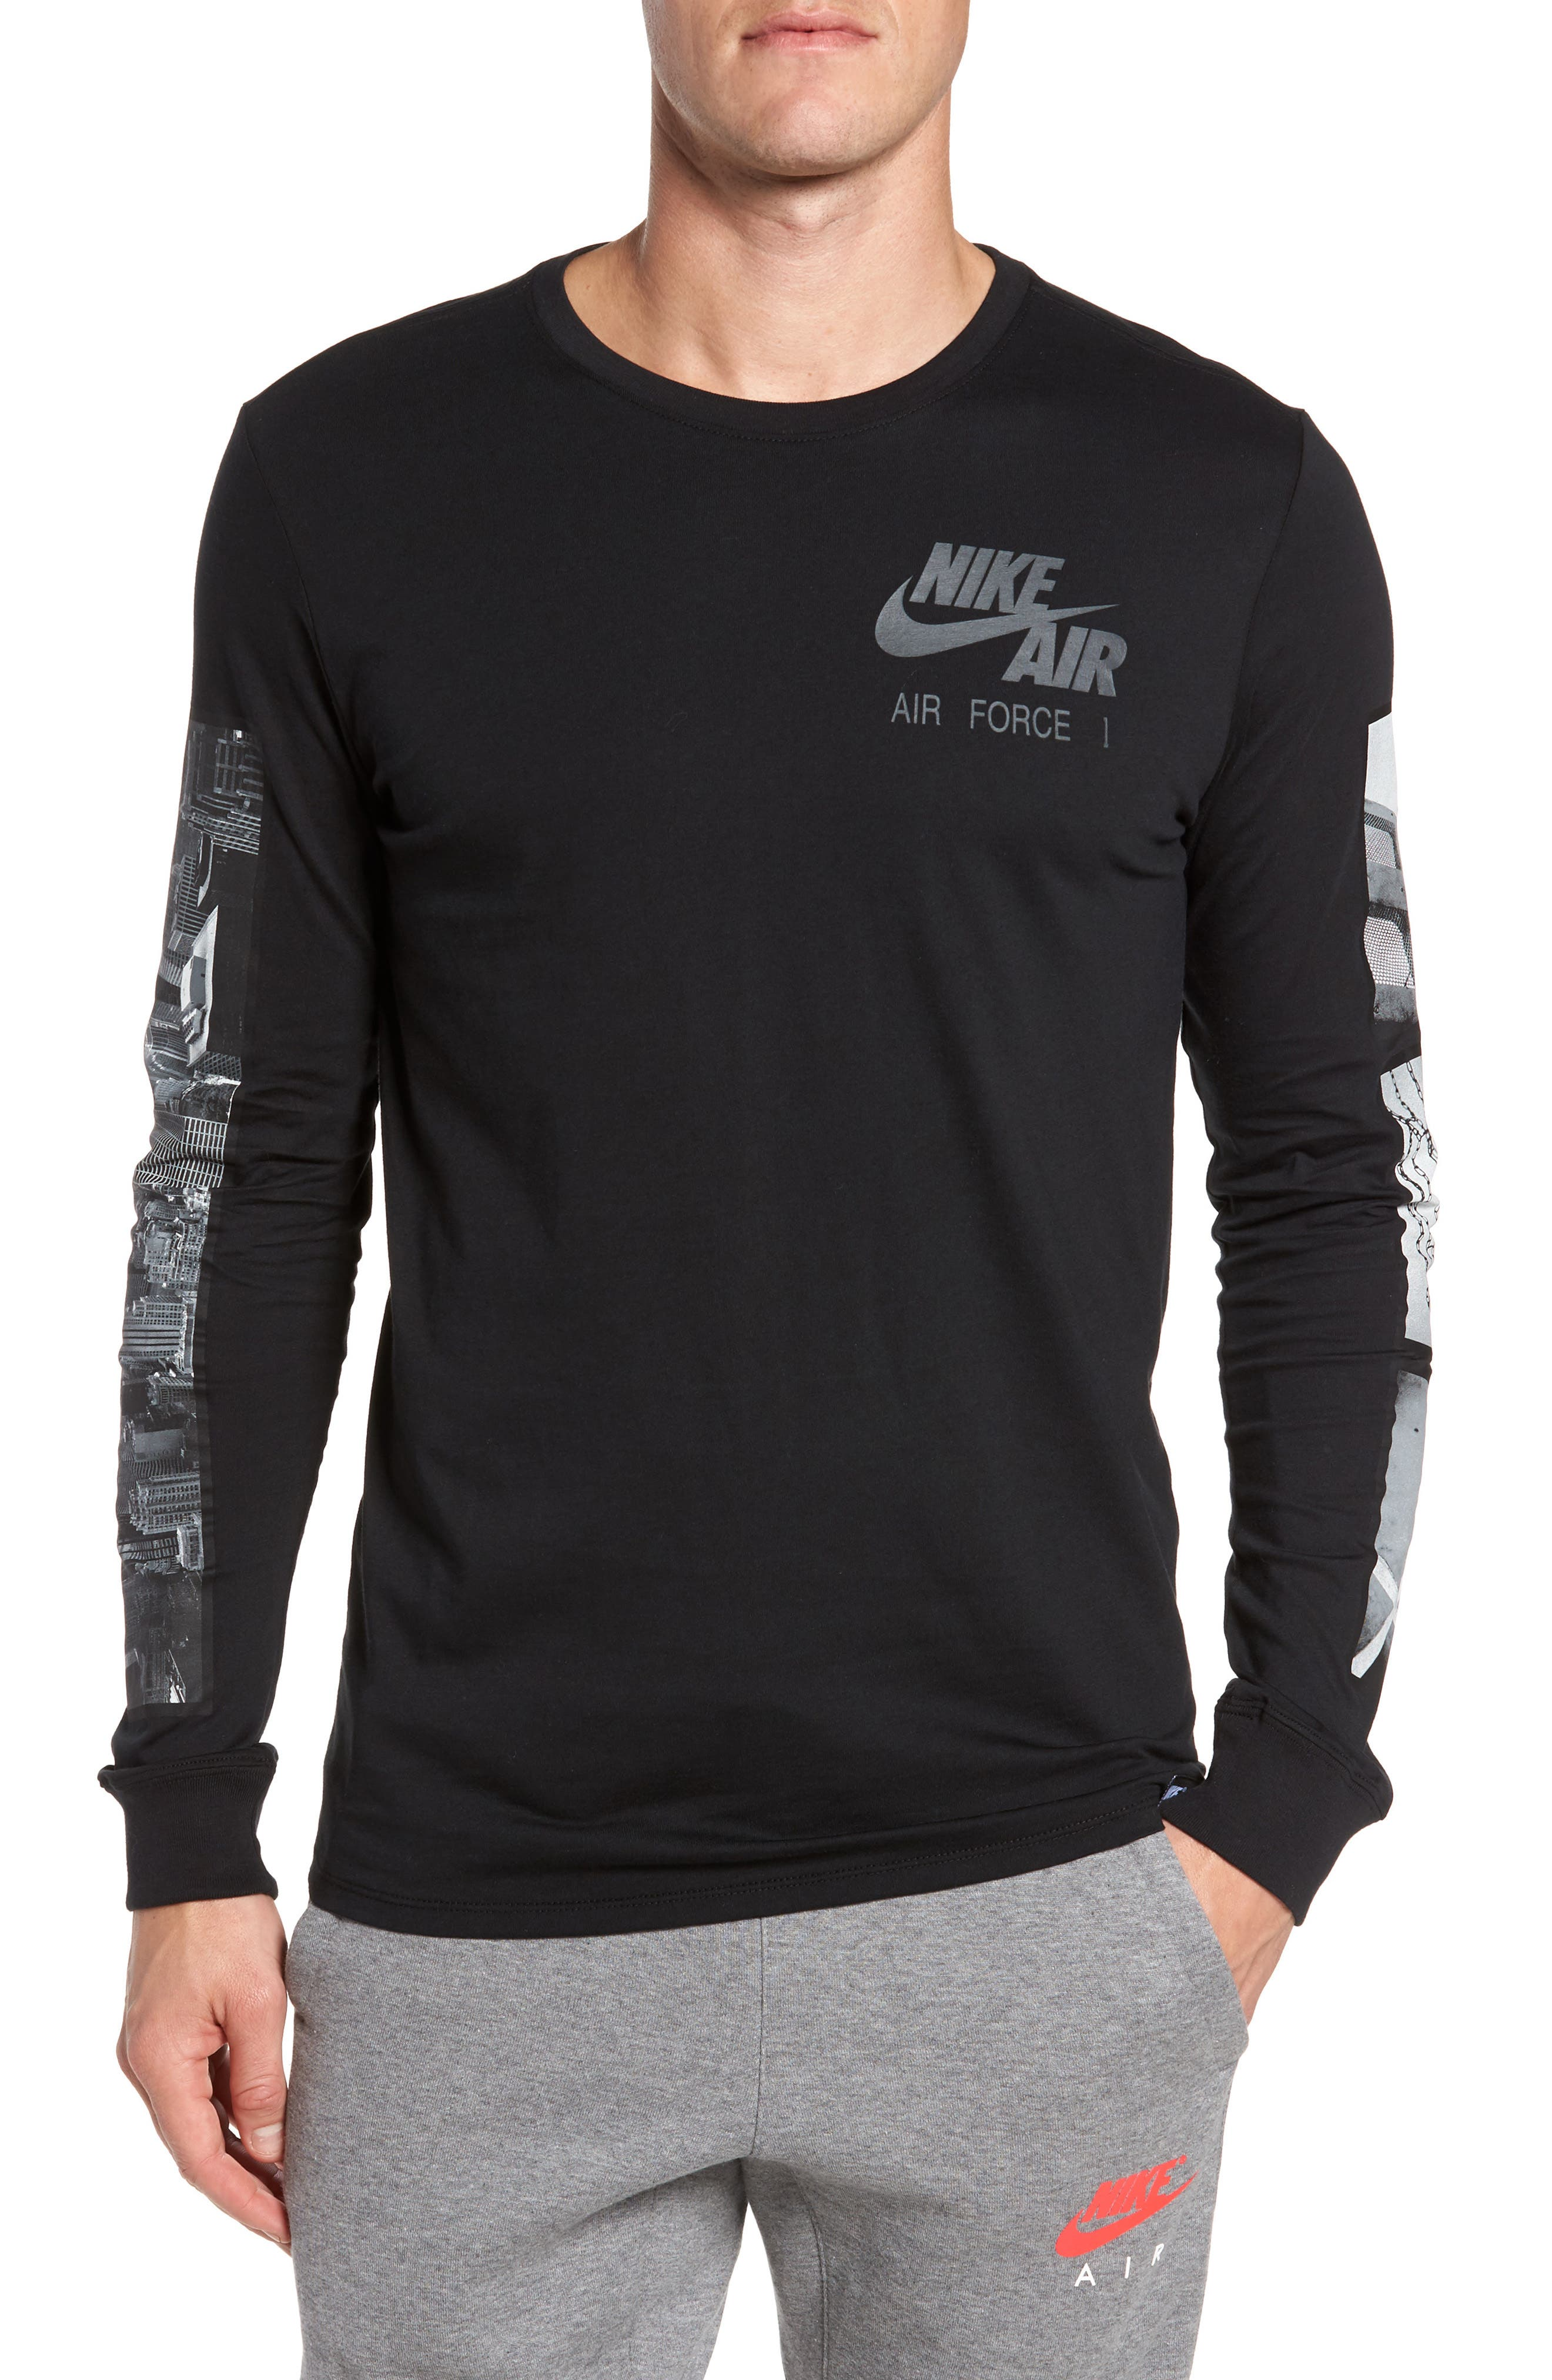 Nike Air Force 1 Long Sleeve T-Shirt